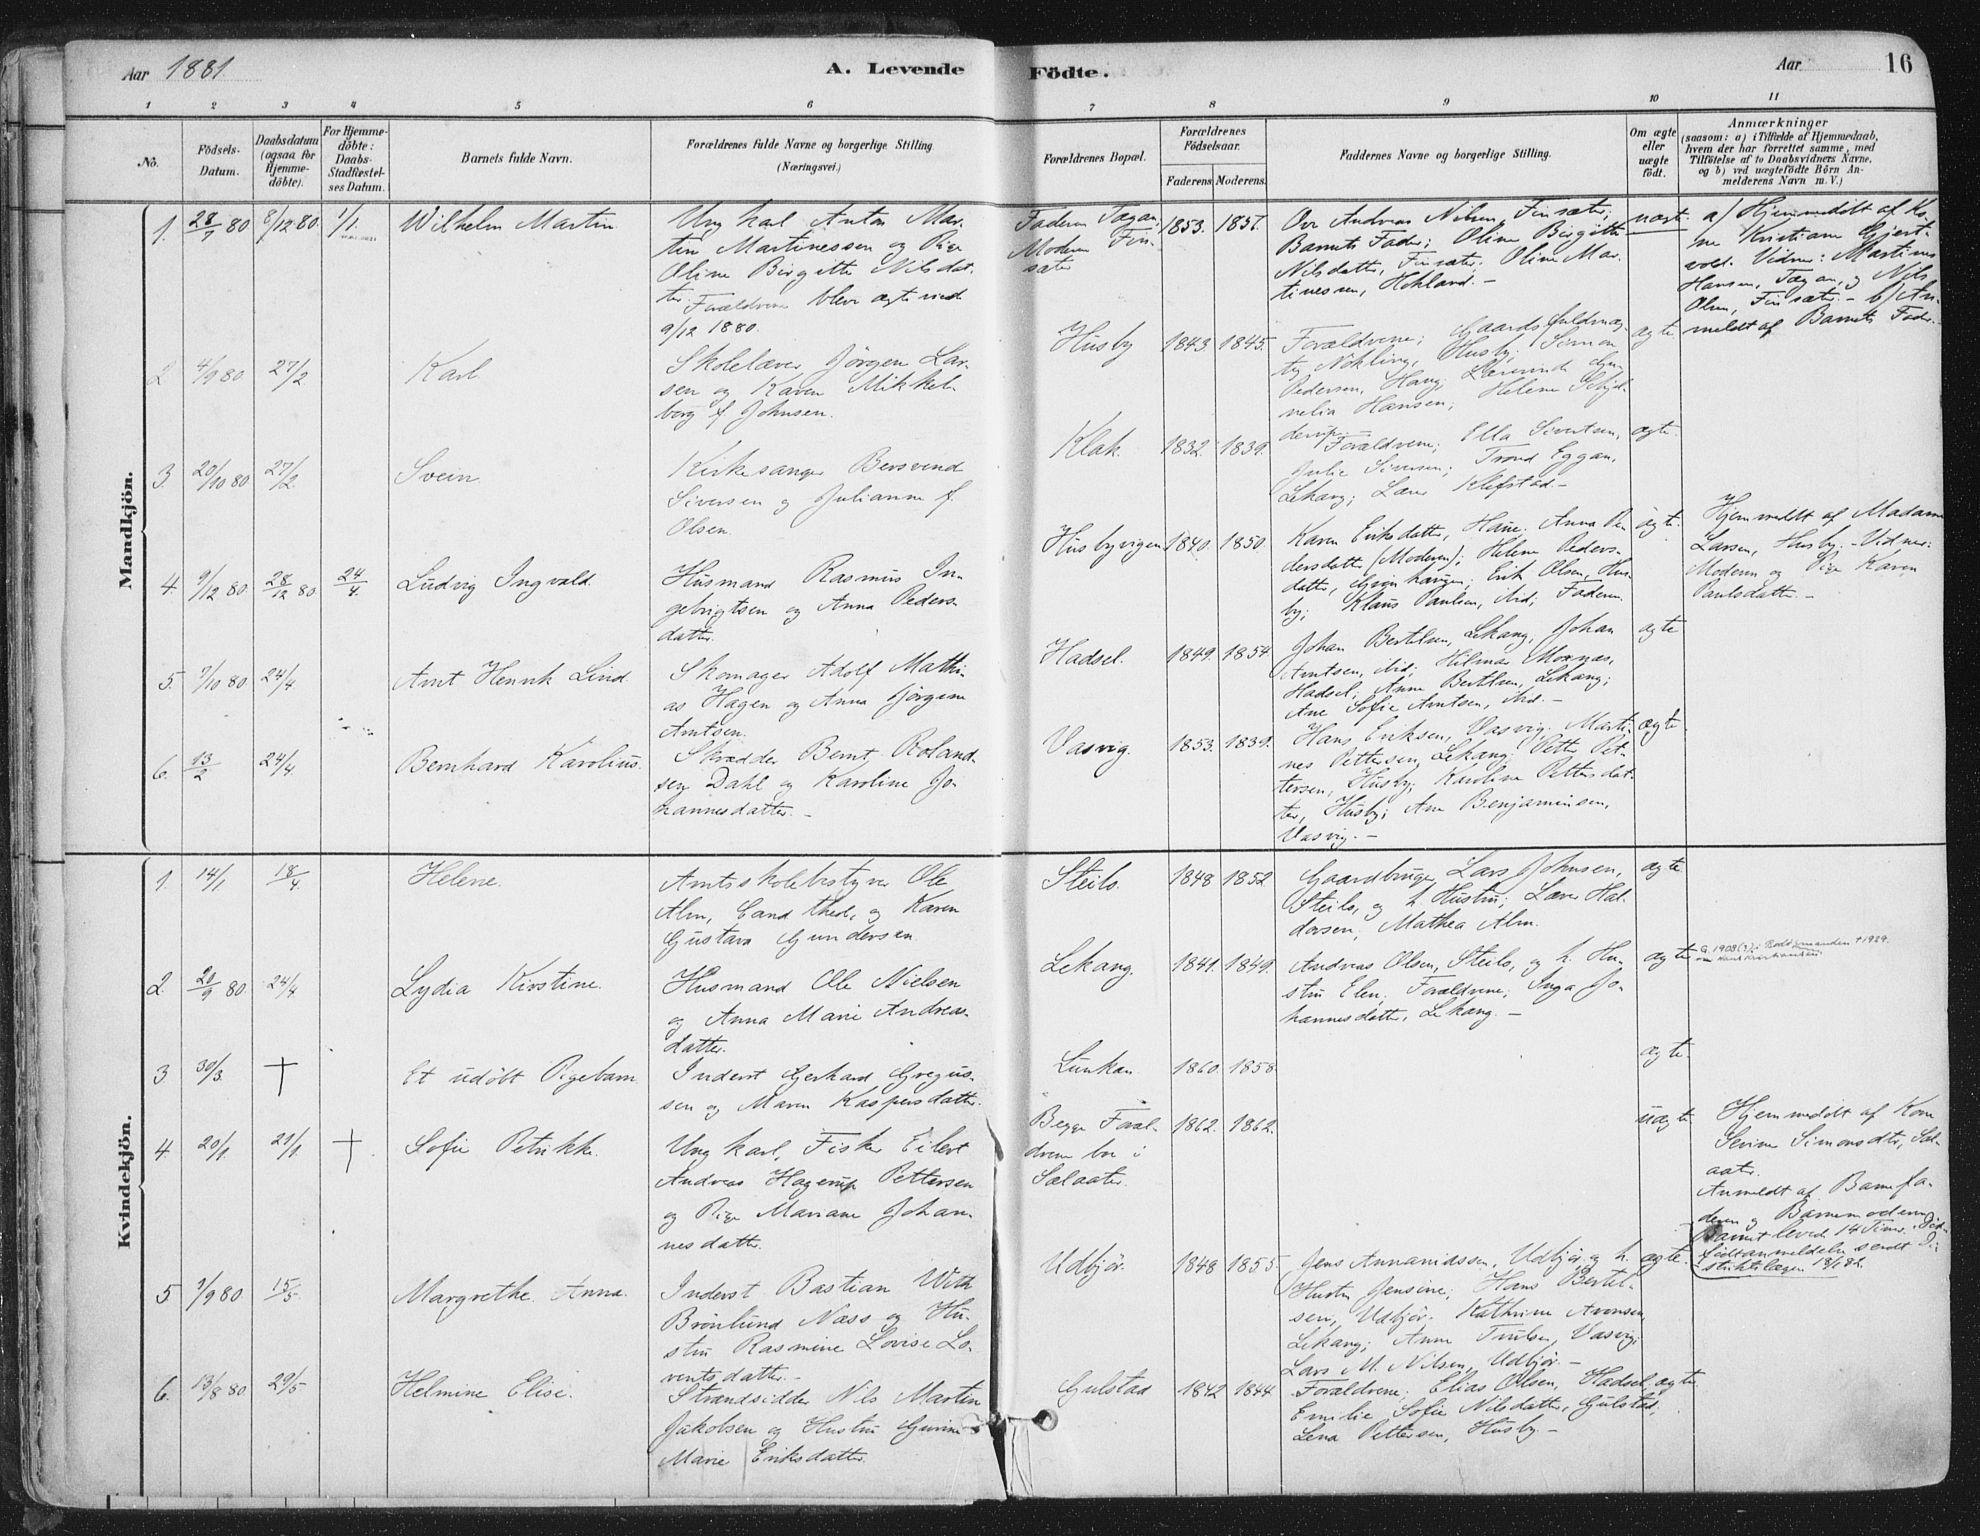 SAT, Ministerialprotokoller, klokkerbøker og fødselsregistre - Nordland, 888/L1244: Ministerialbok nr. 888A10, 1880-1890, s. 16